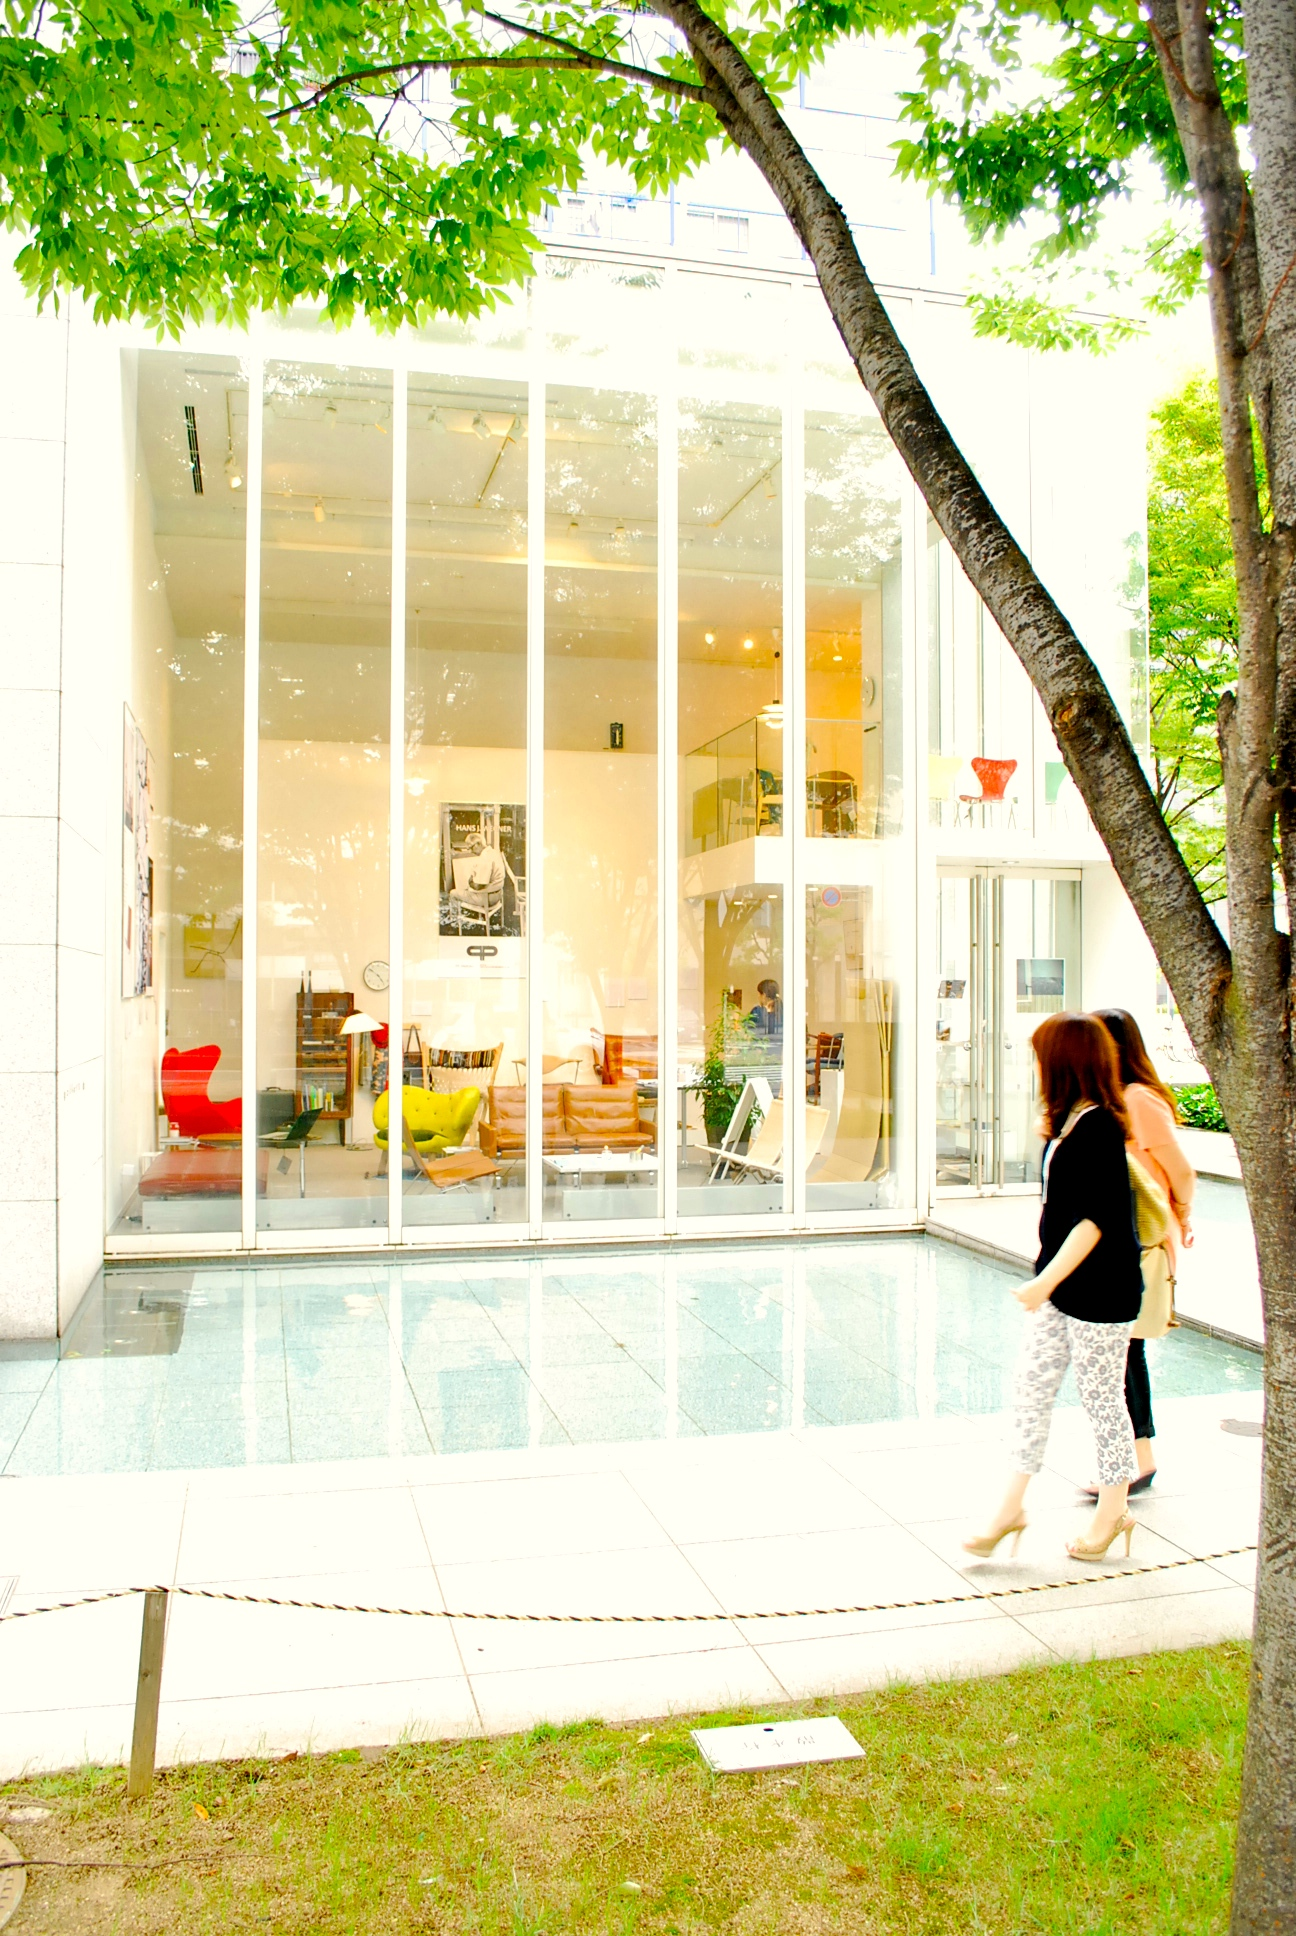 http://www.sora-design.com/images/bl-2737.jpg